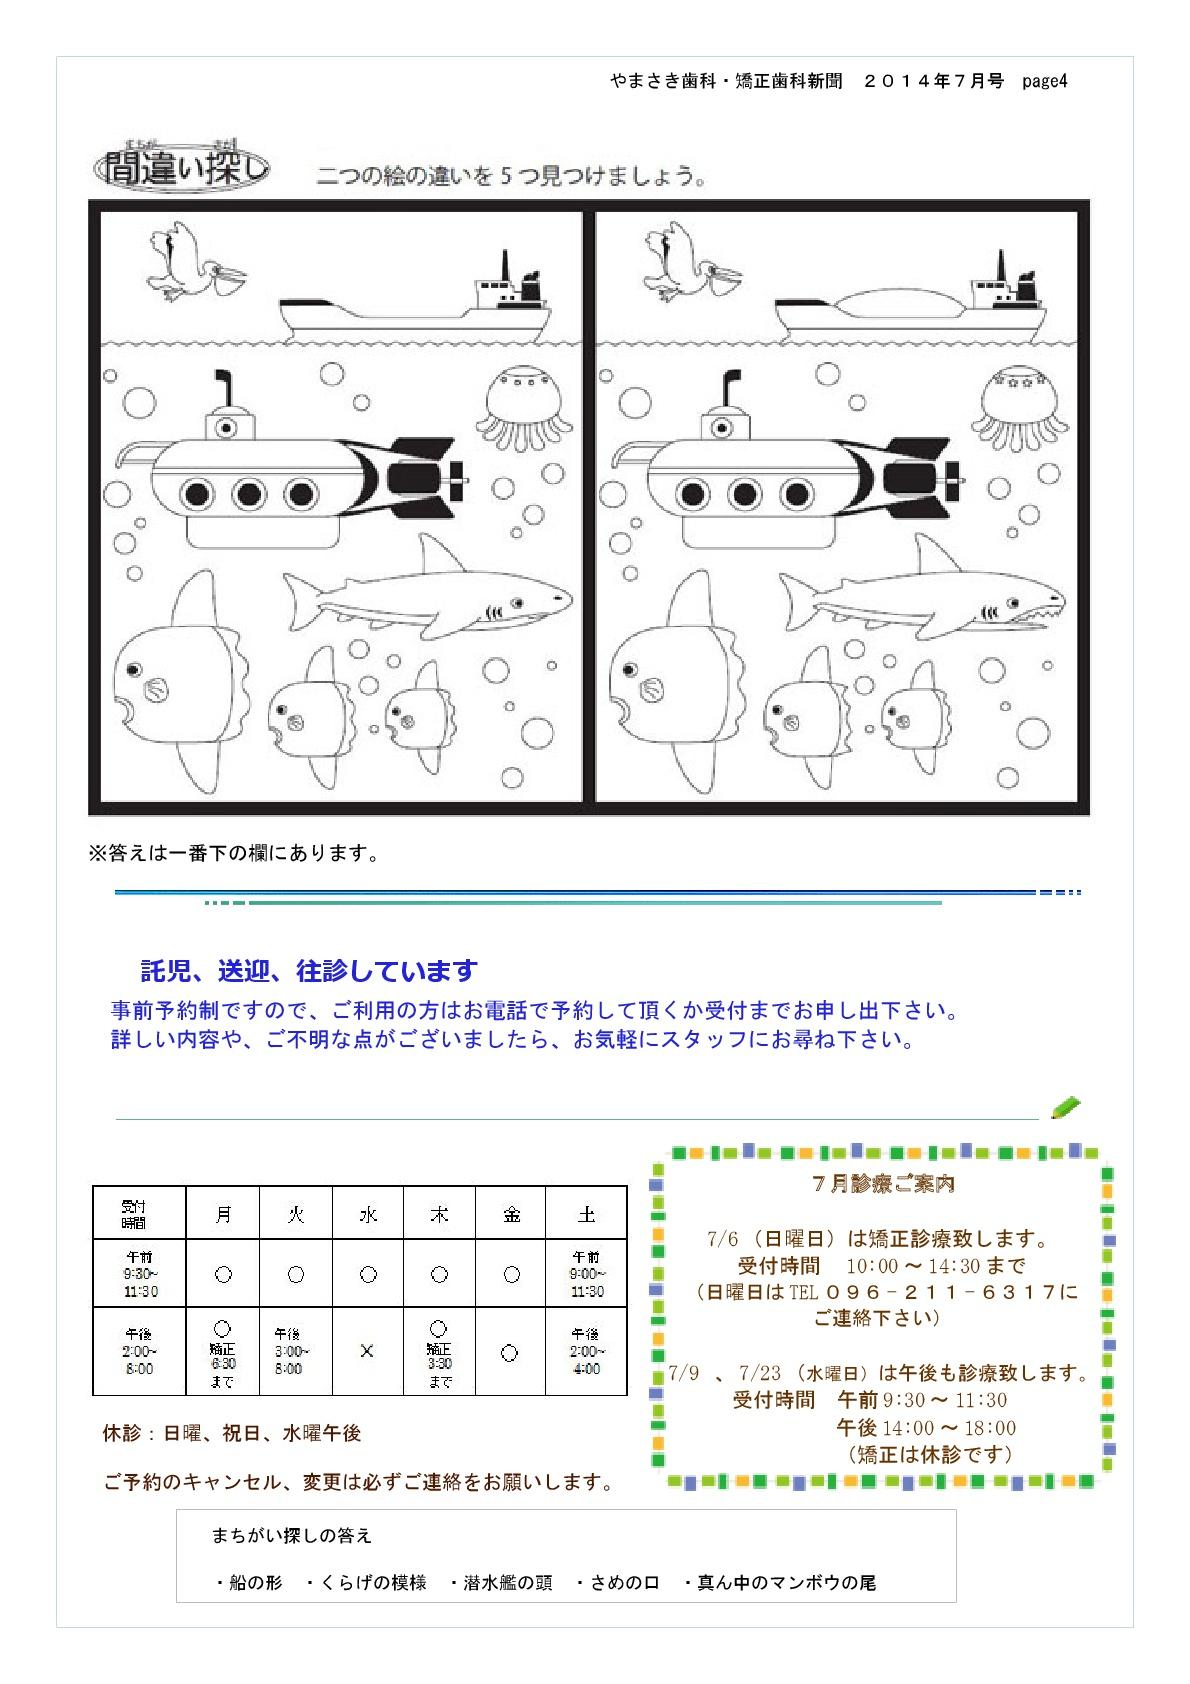 sinbun14-7-2-003